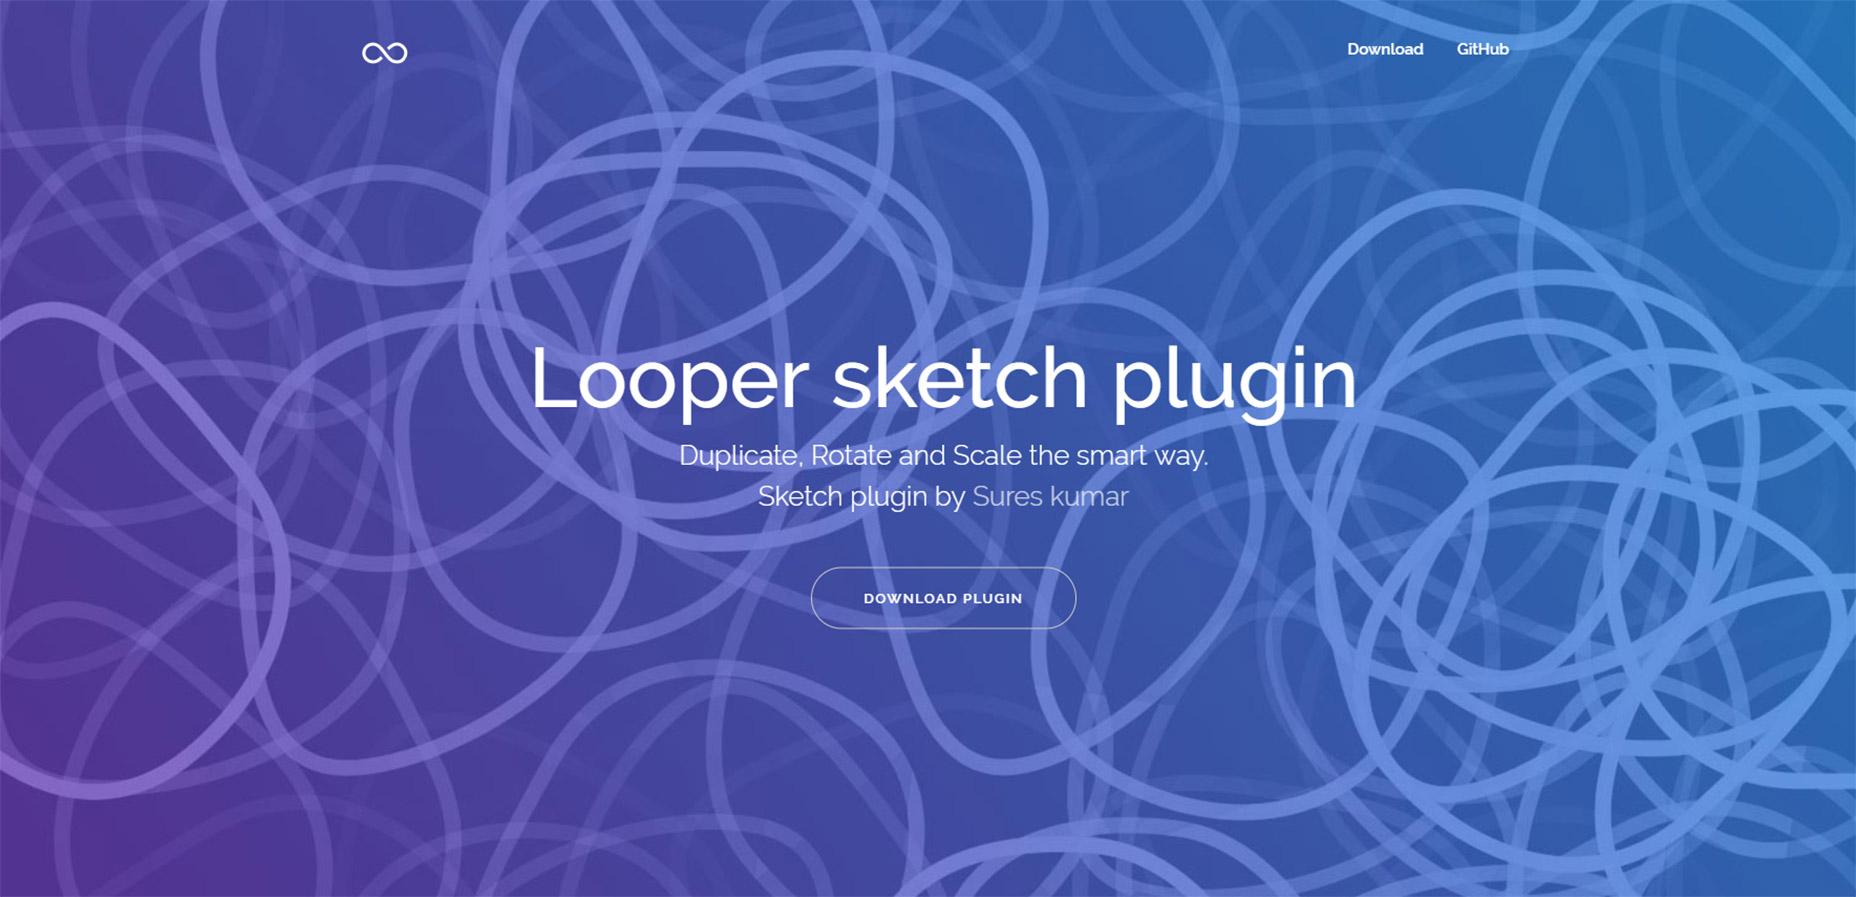 05-looper-sketch-plugin